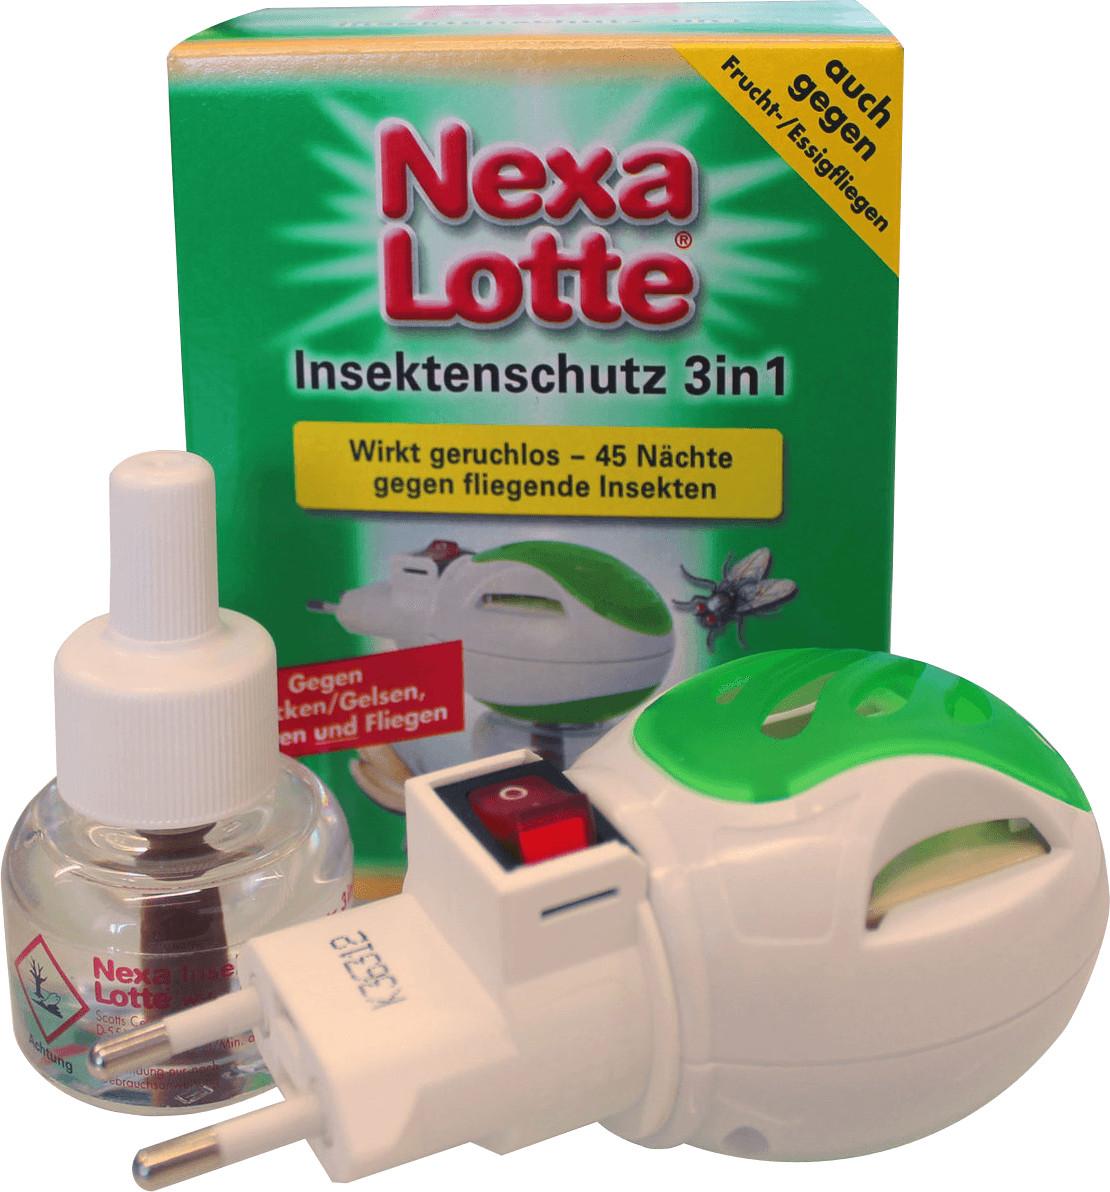 Nexa Lotte Insektenschutz 3in1